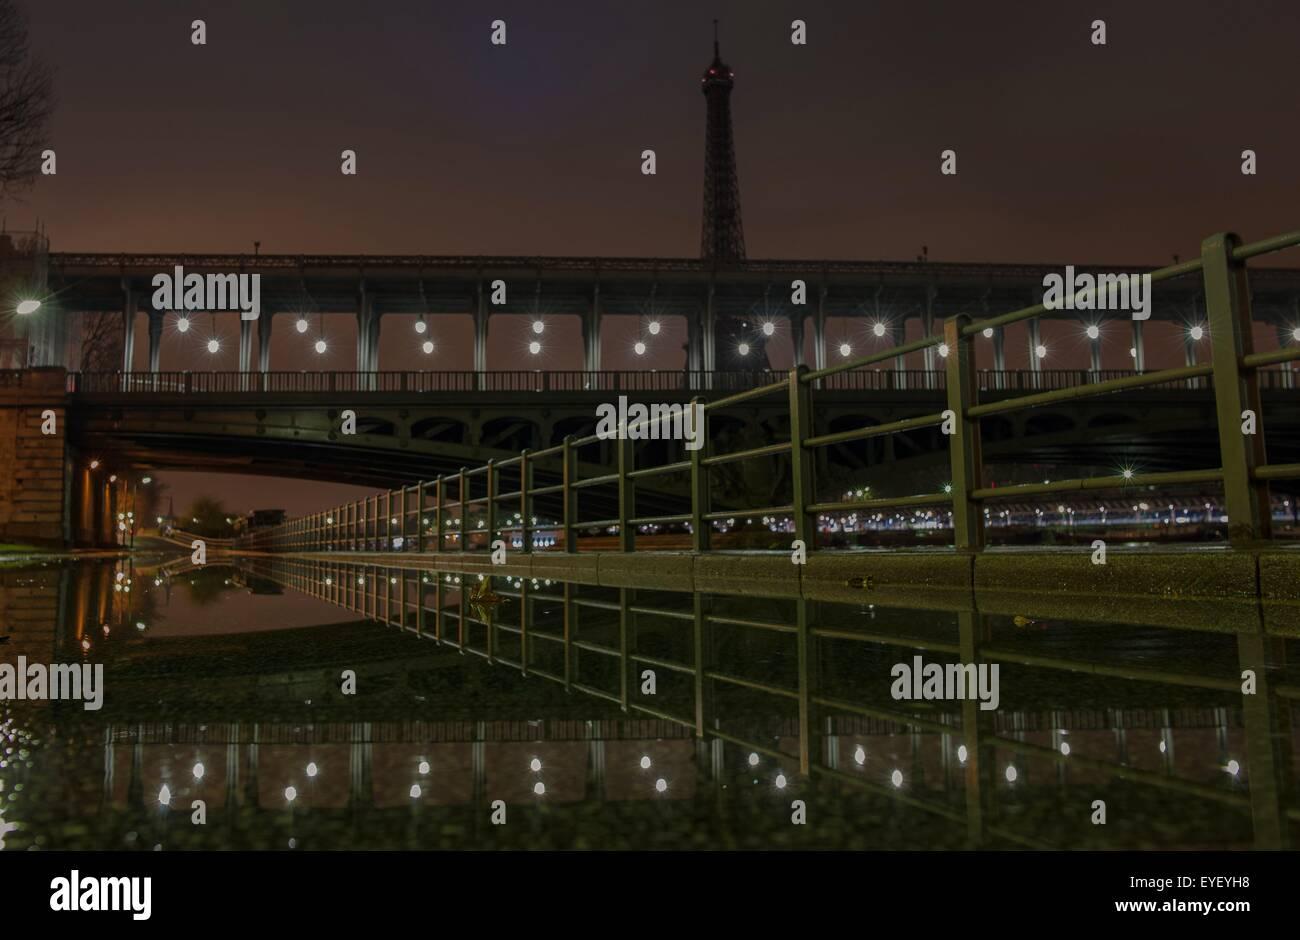 Floods of the Seine on riverside expressways and bridge of Bir-Hakeim with the Eiffel Tower at night 11/02/2013 - Stock Image